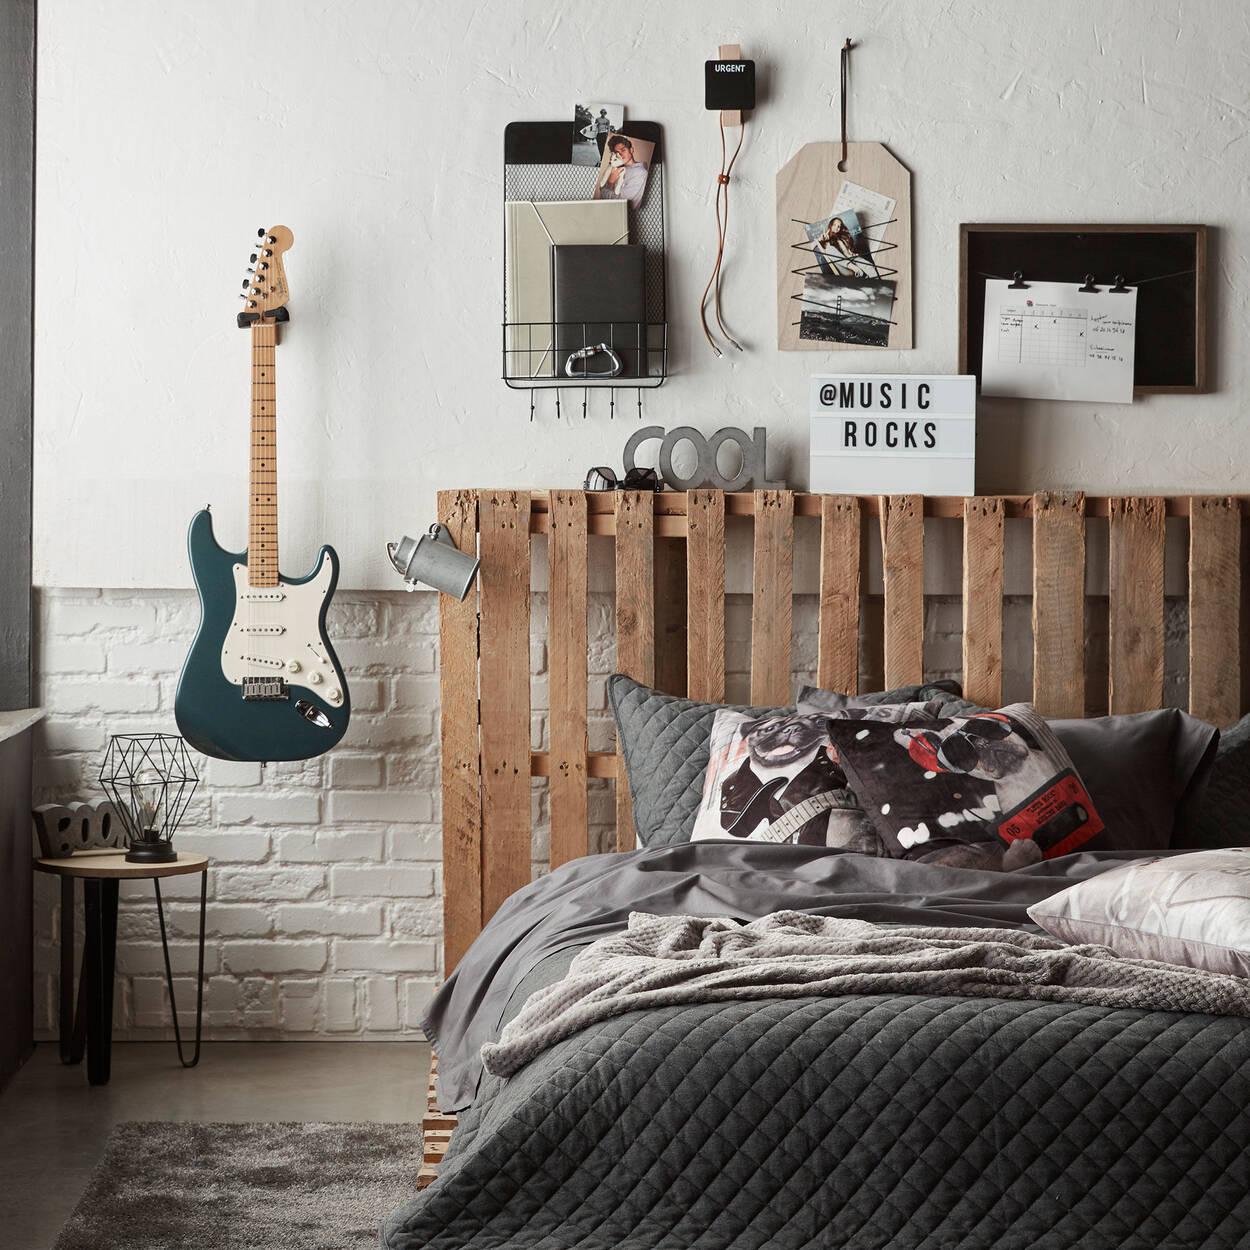 mot d coratif en ciment boom. Black Bedroom Furniture Sets. Home Design Ideas